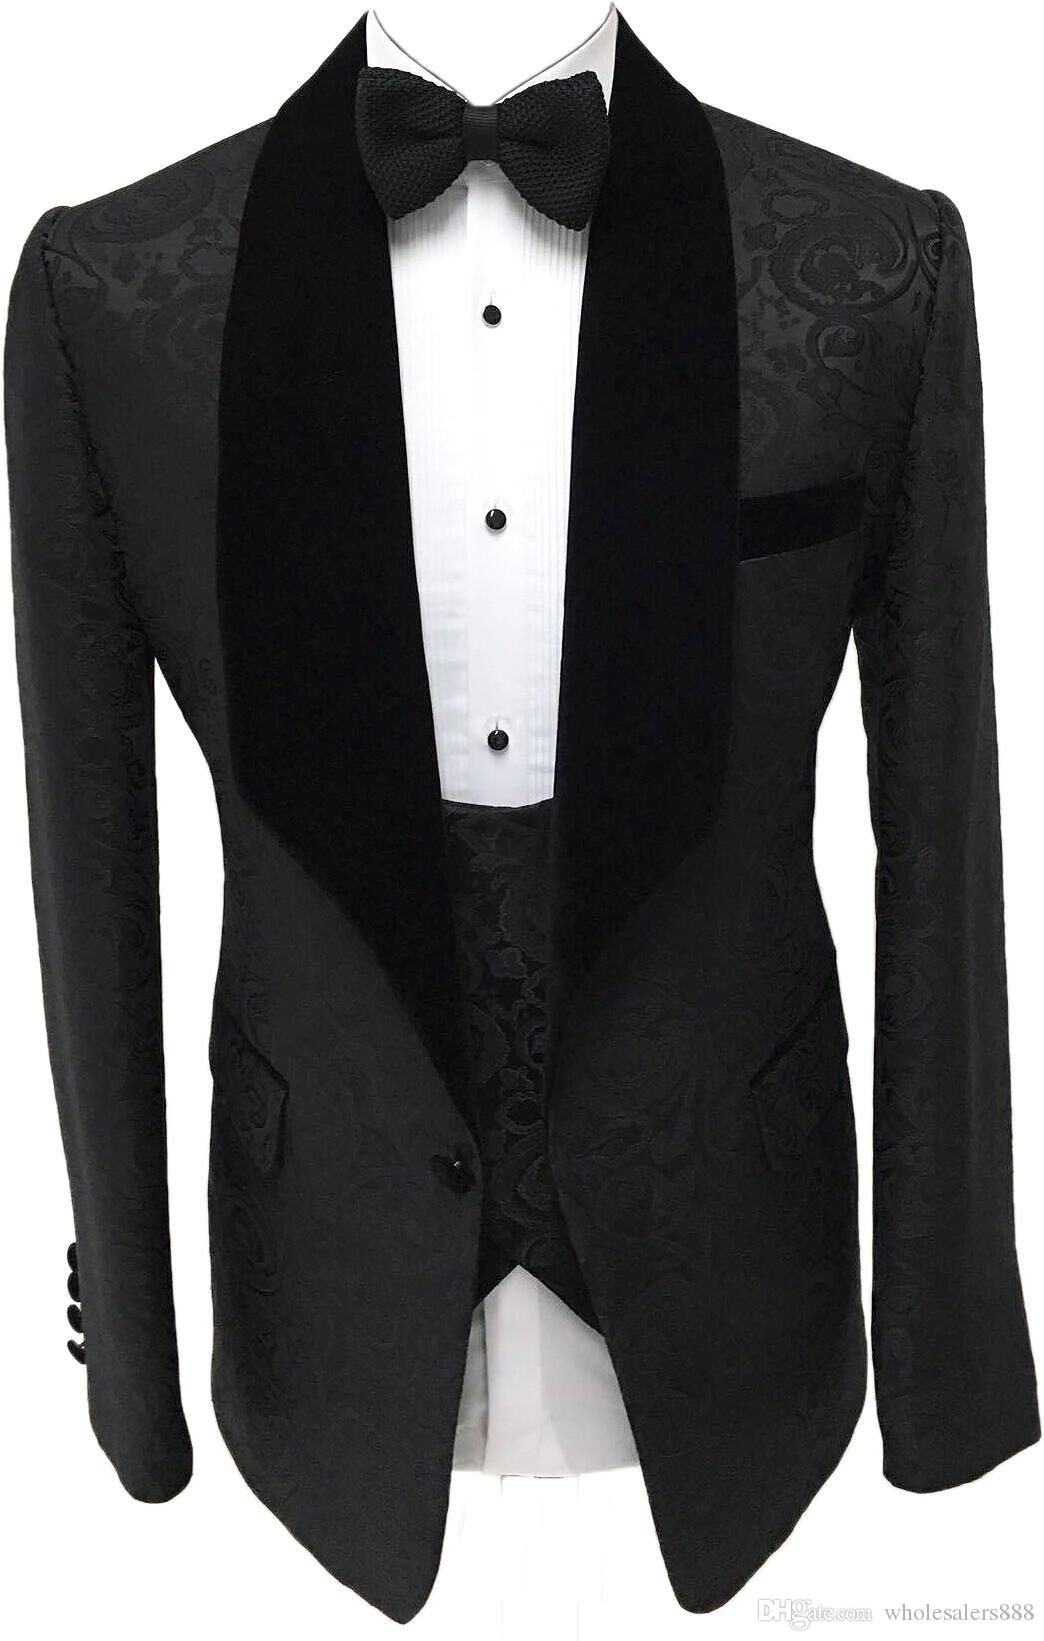 Newest Groomsmen Black Pattern Groom Tuxedos Shawl Velvet Lapel Men Suits Side Vent Wedding/Prom Best Man ( Jacket+Pants+Tie+Vest ) K995